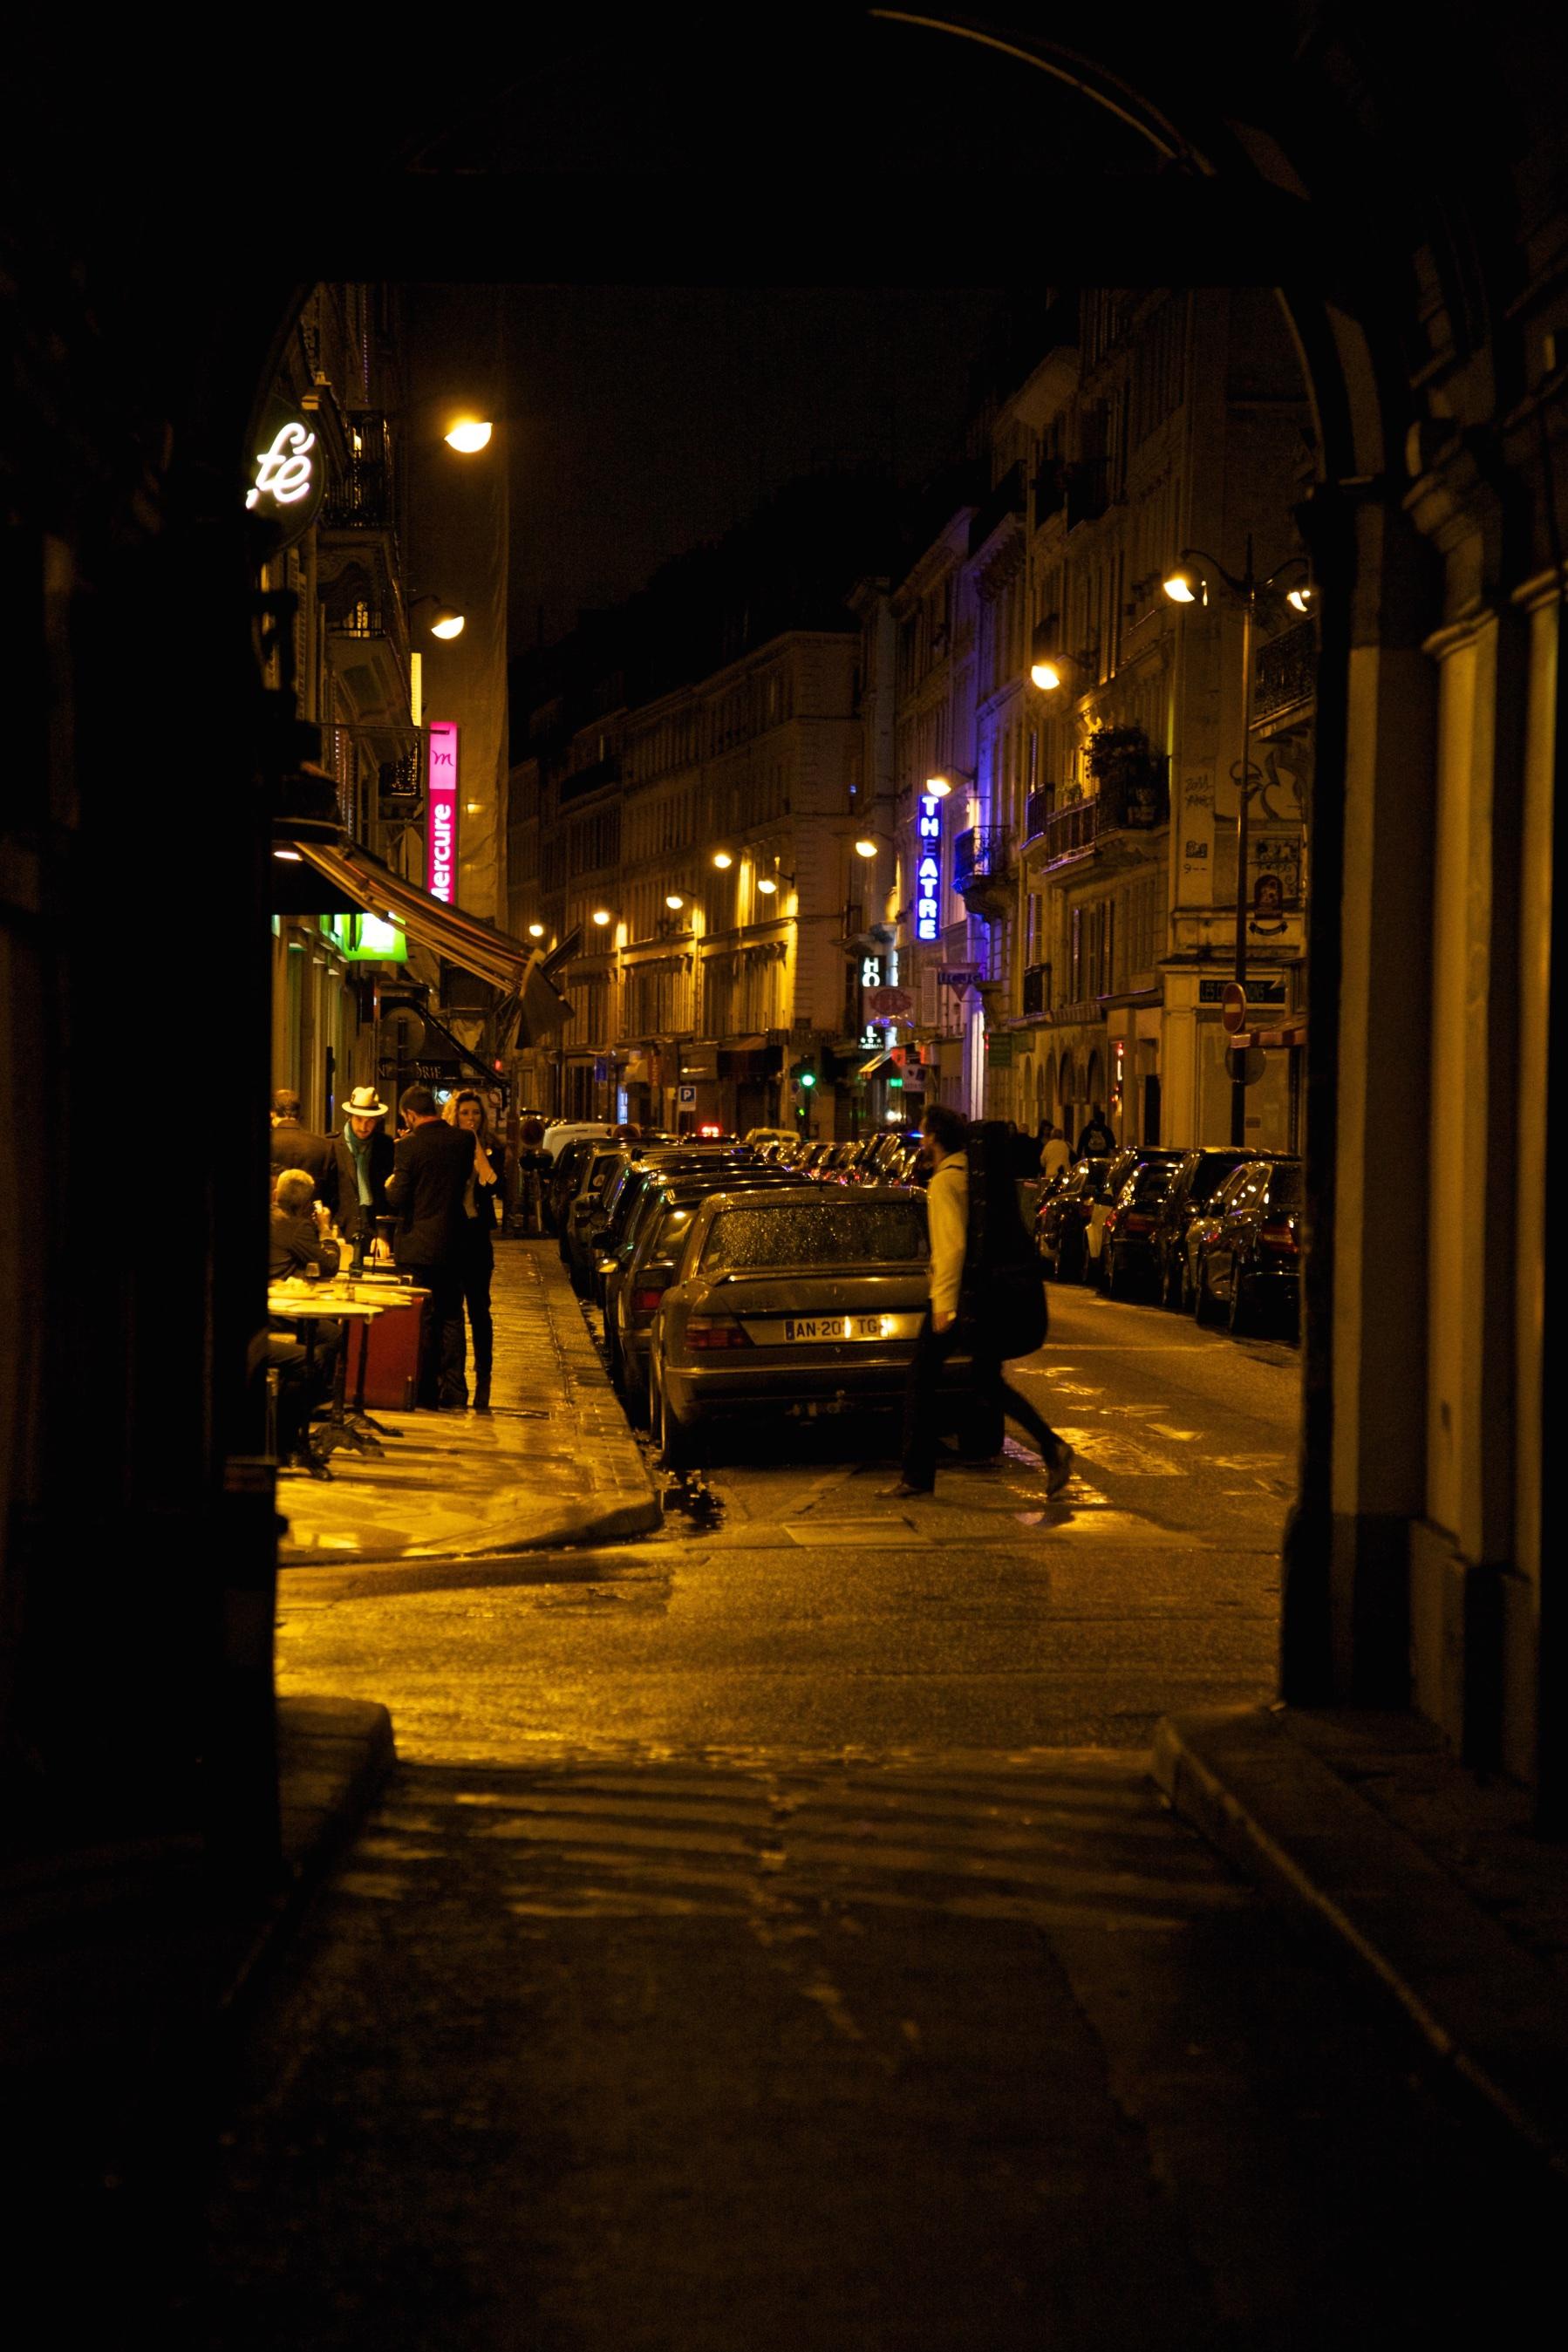 Night scene. Paris, France.